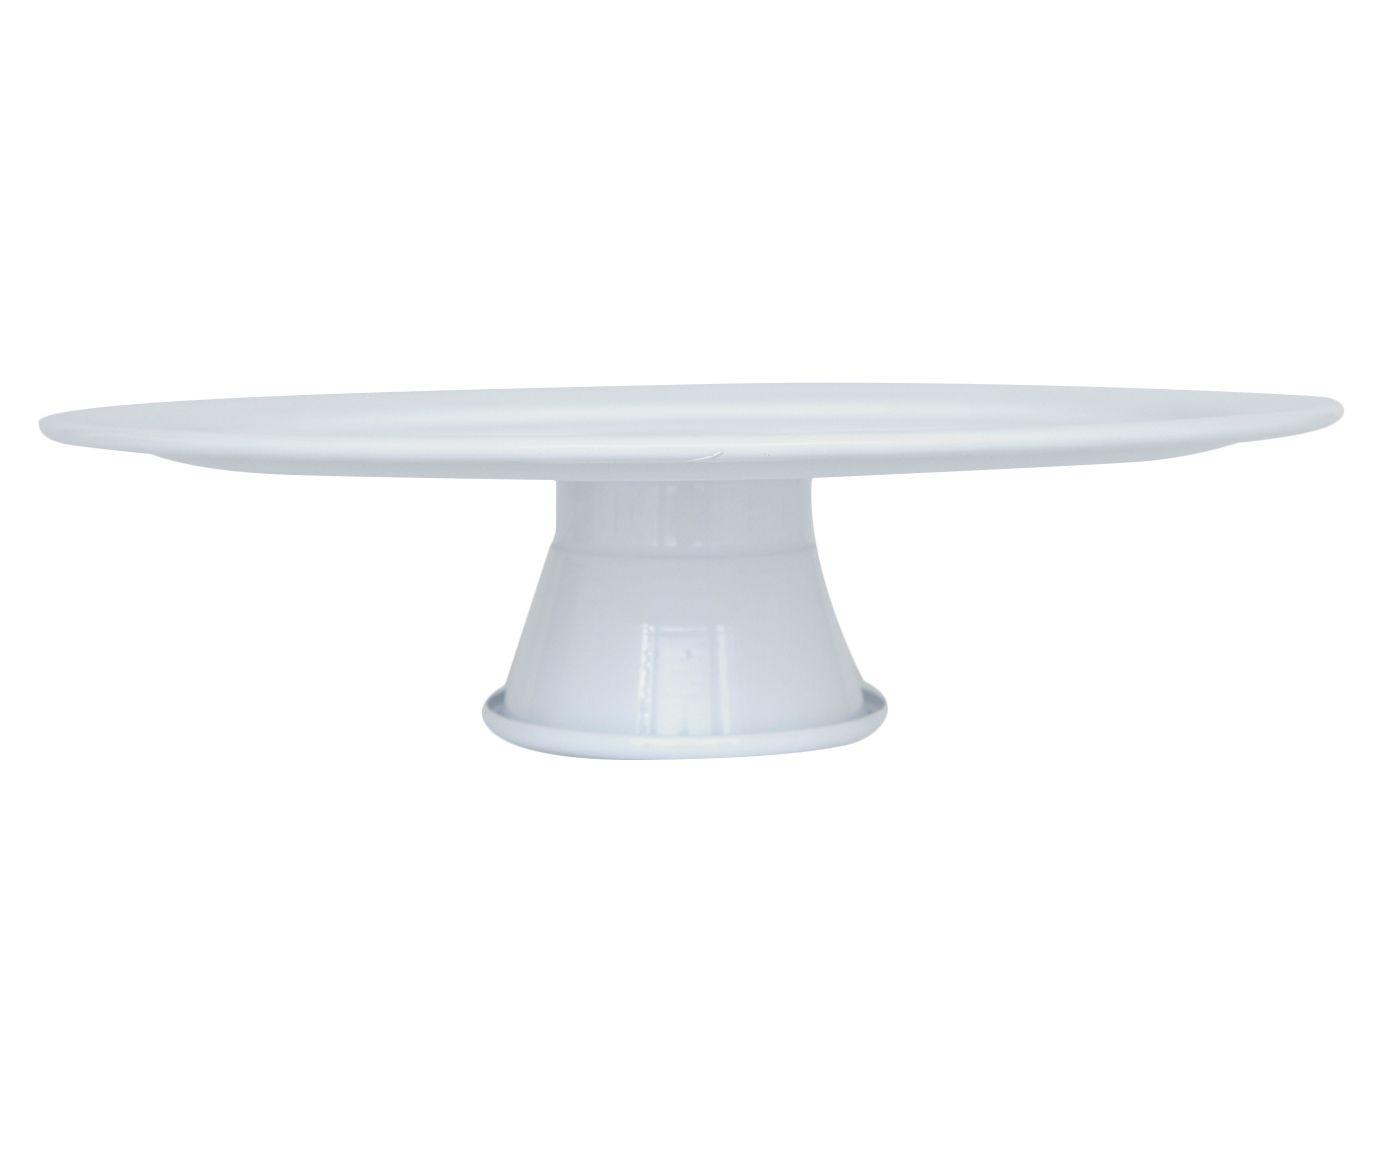 Prato para Doces Najoe Branco - 29cm   Westwing.com.br